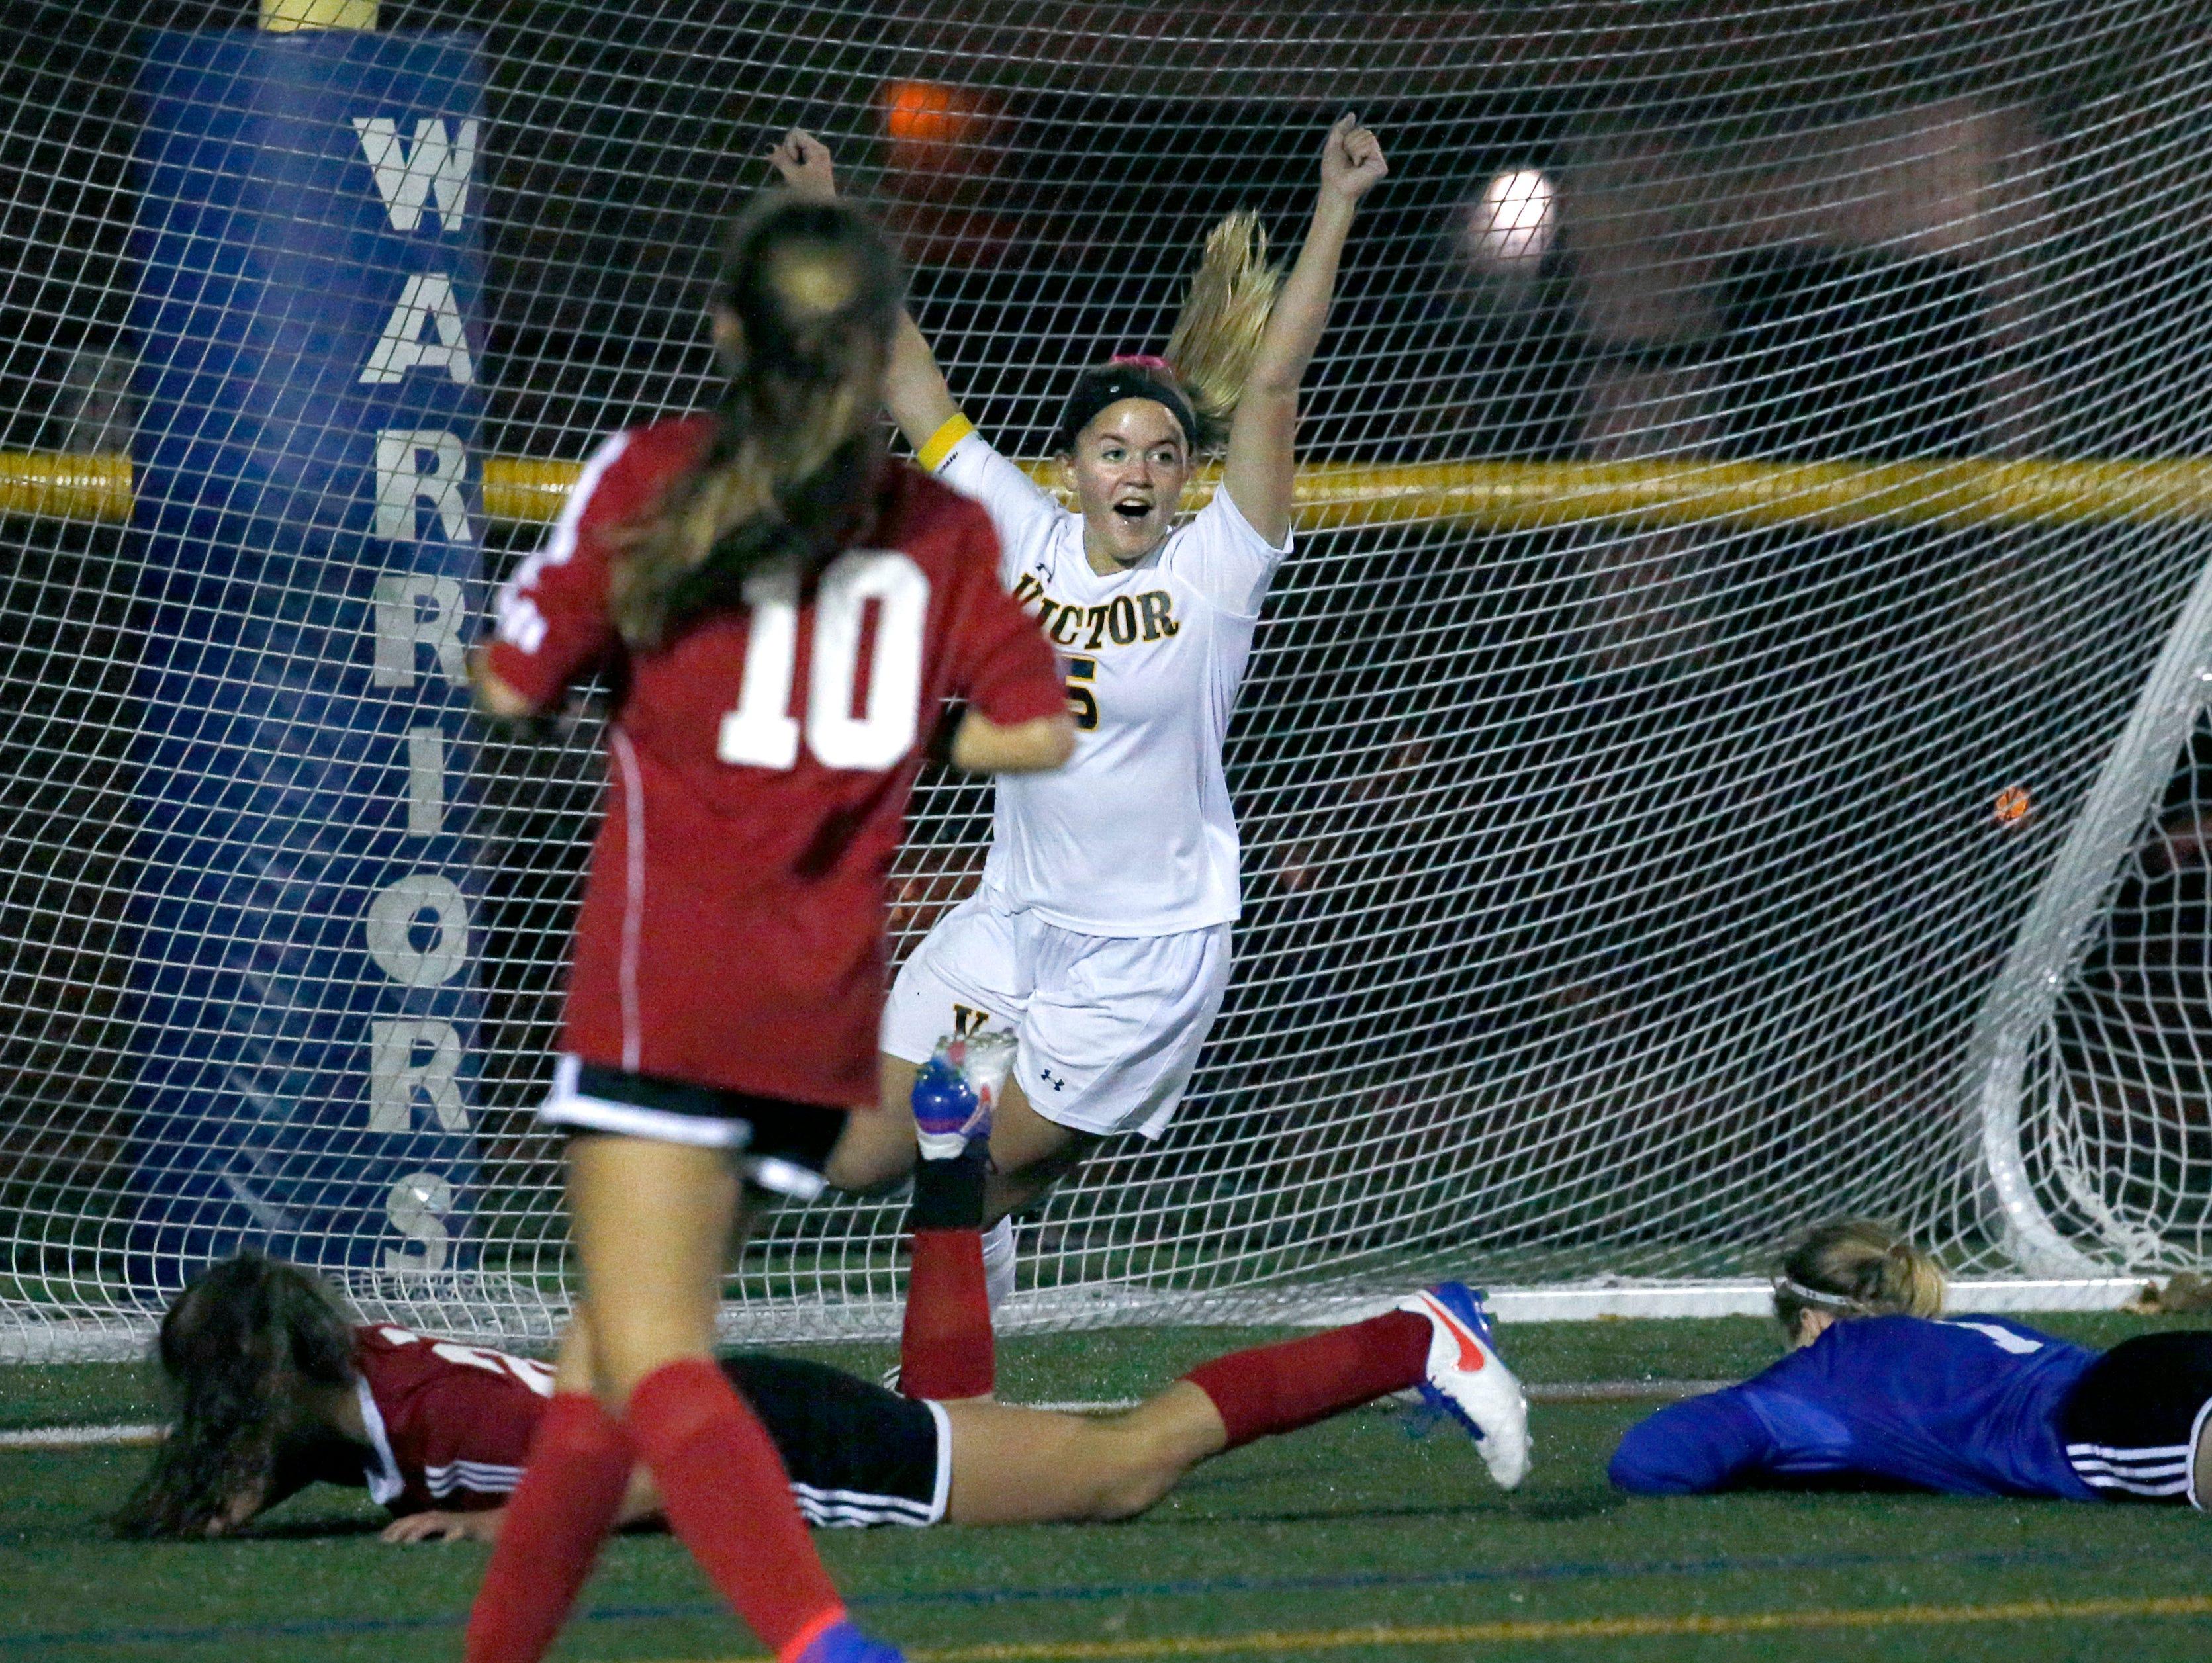 Victor's Anna Schwarzweller celebrates her teammate Lauren Buddendeck's goal to lead Penfield 1-0 in the first half at Webster Schroeder High School.